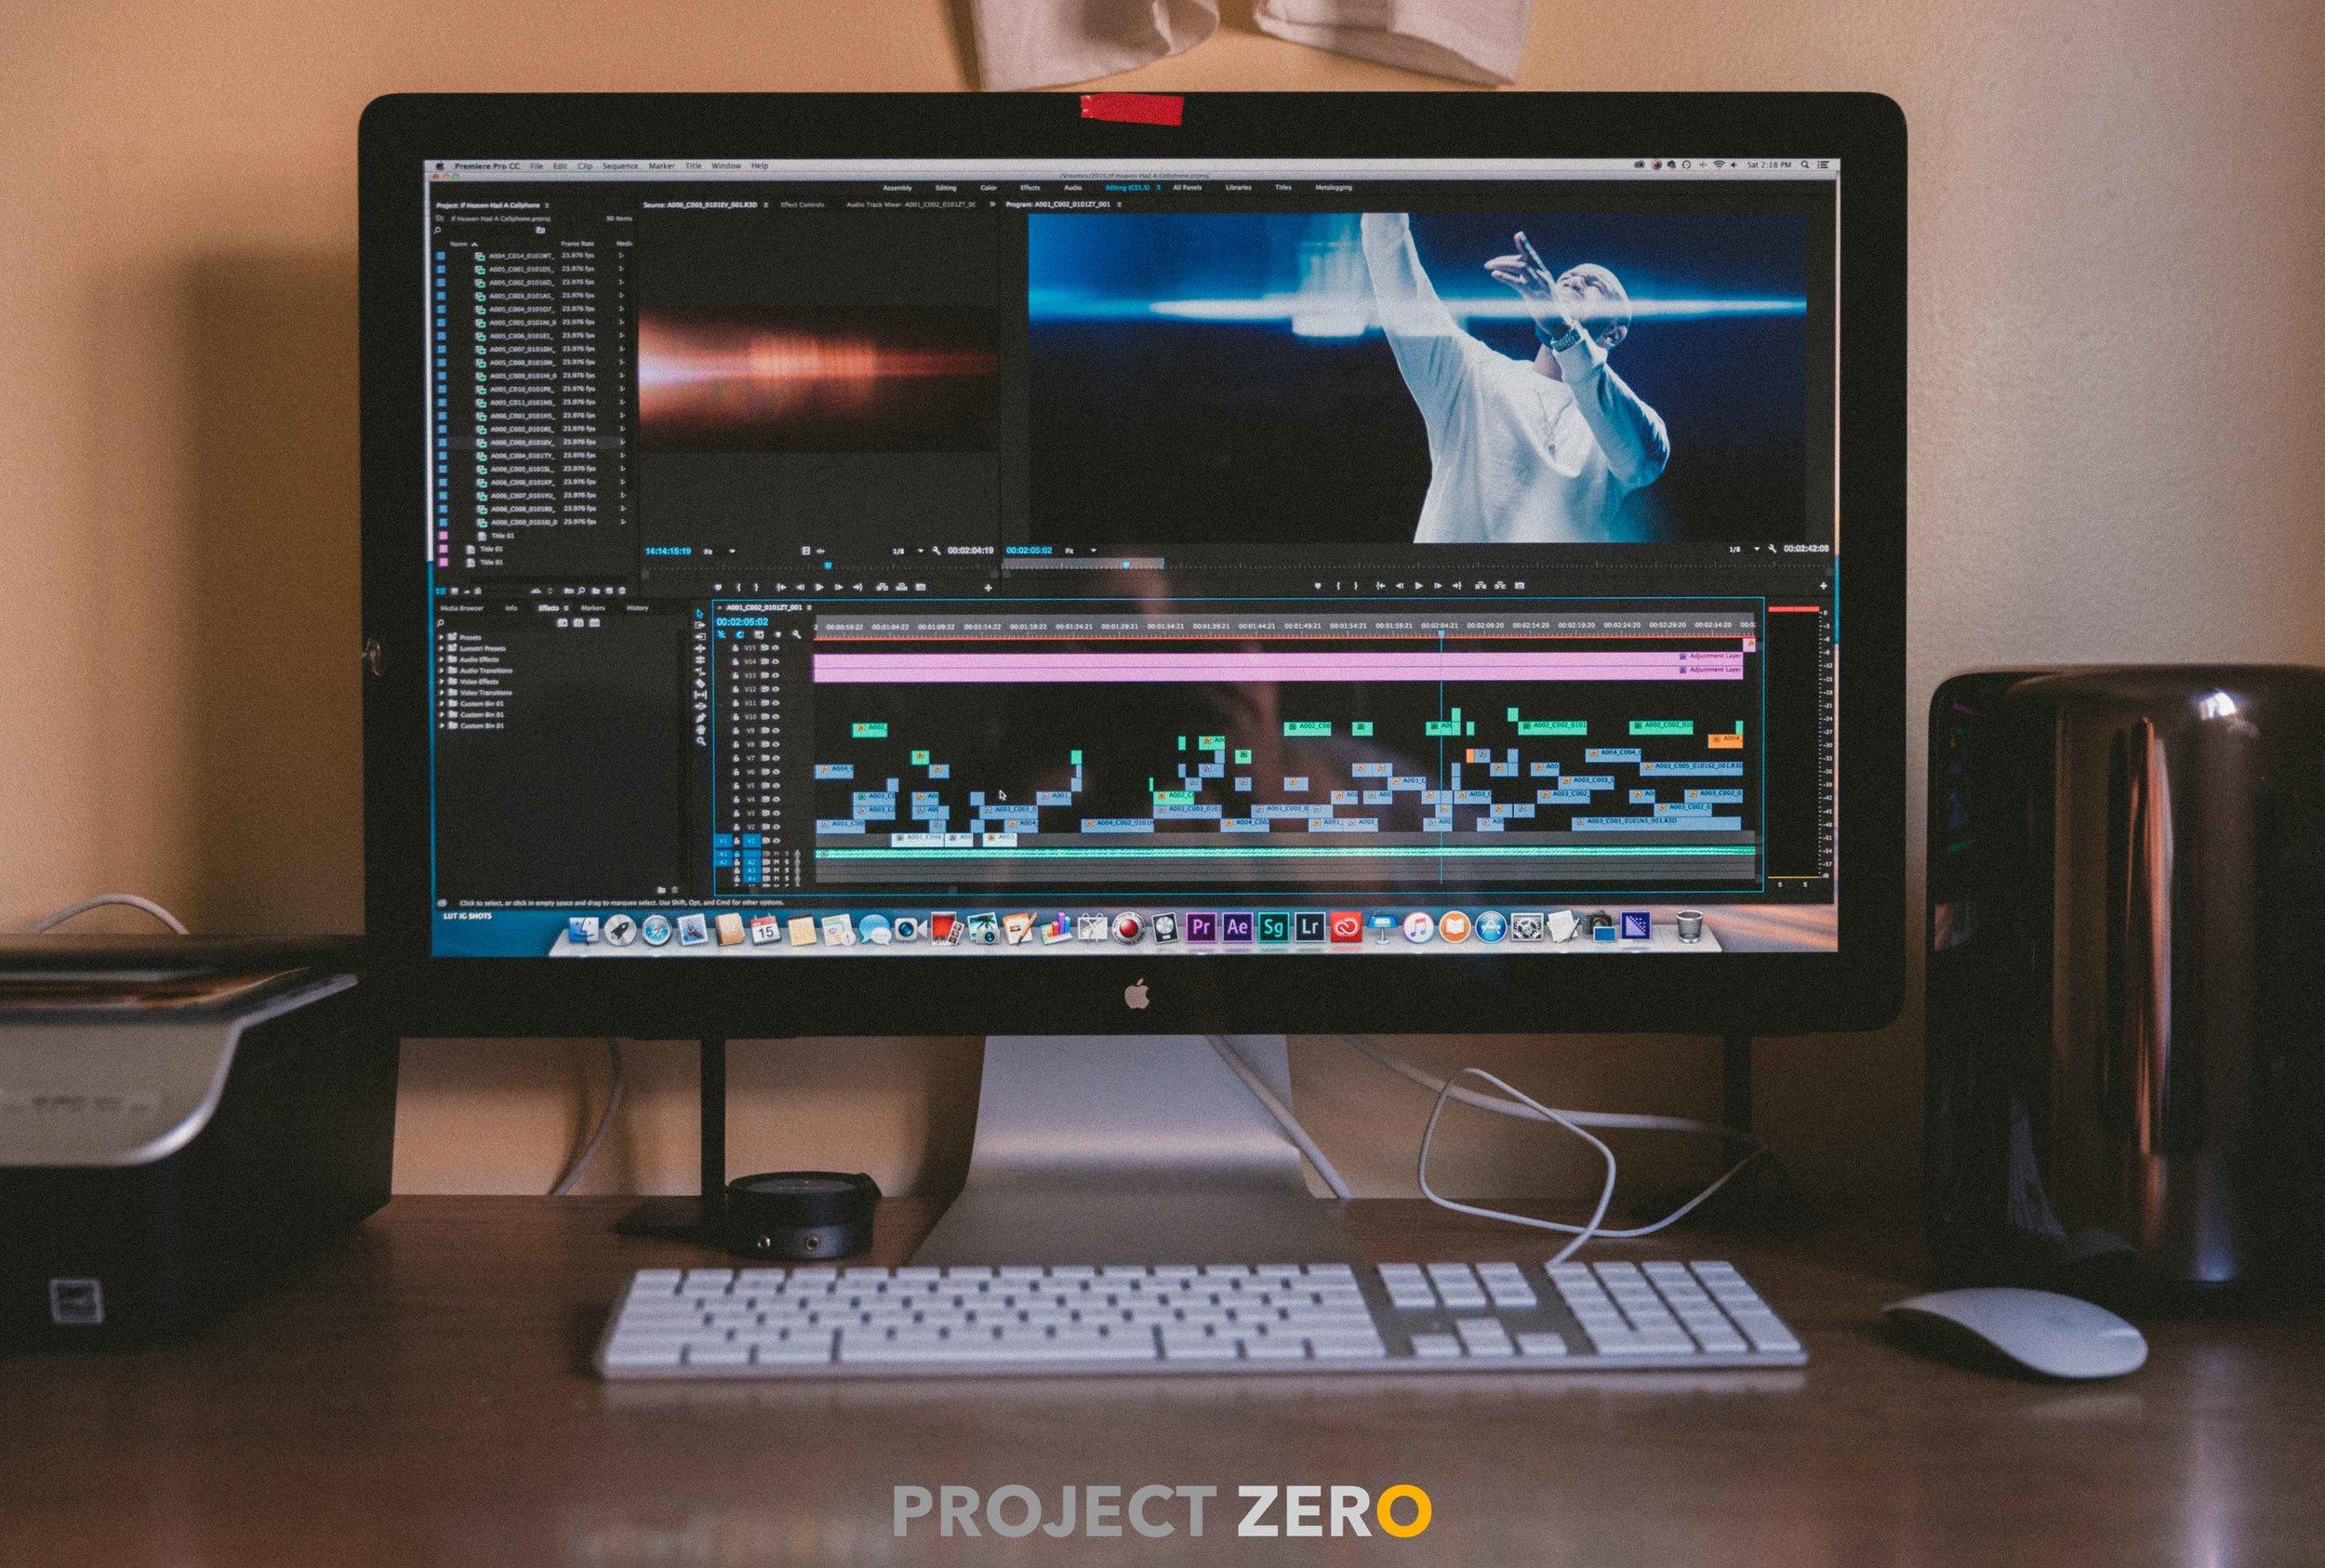 project-zero-11.jpg